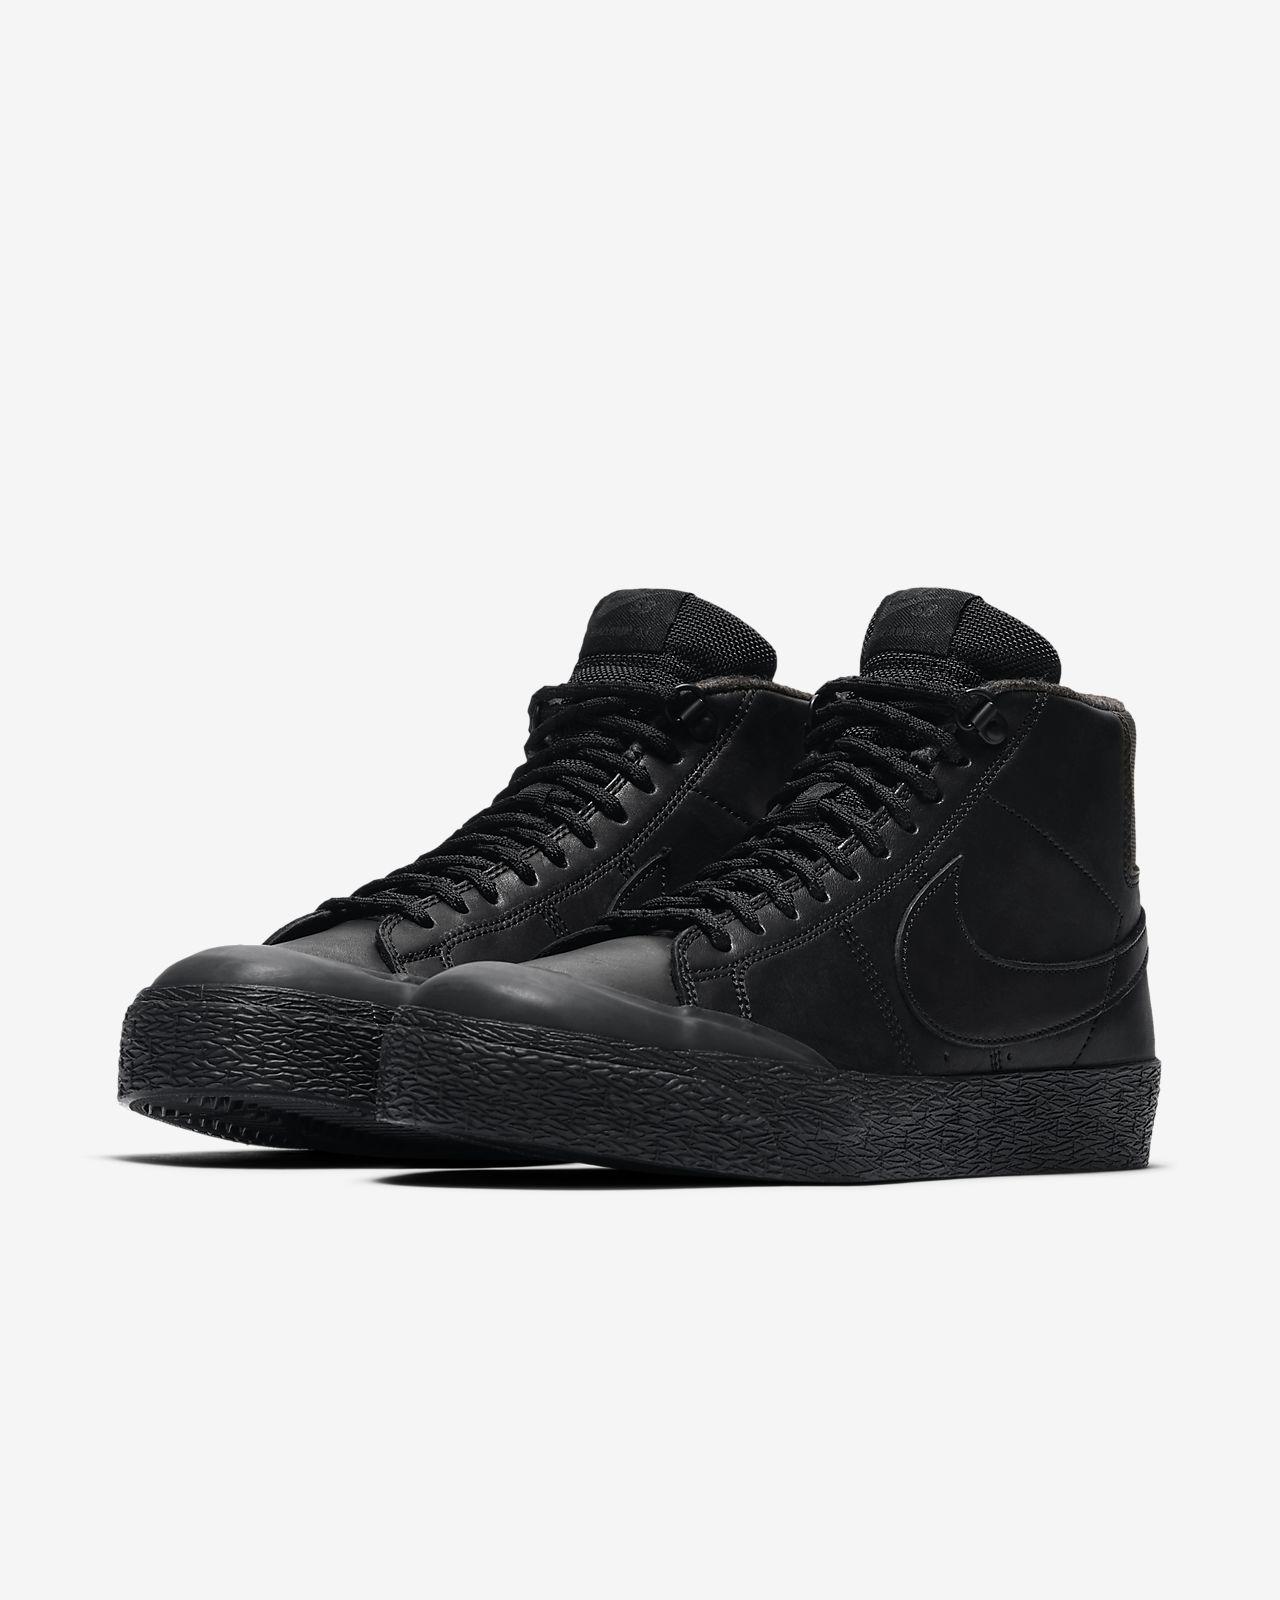 nike blazer skate,Chaussure de skateboard Nike SB Zoom